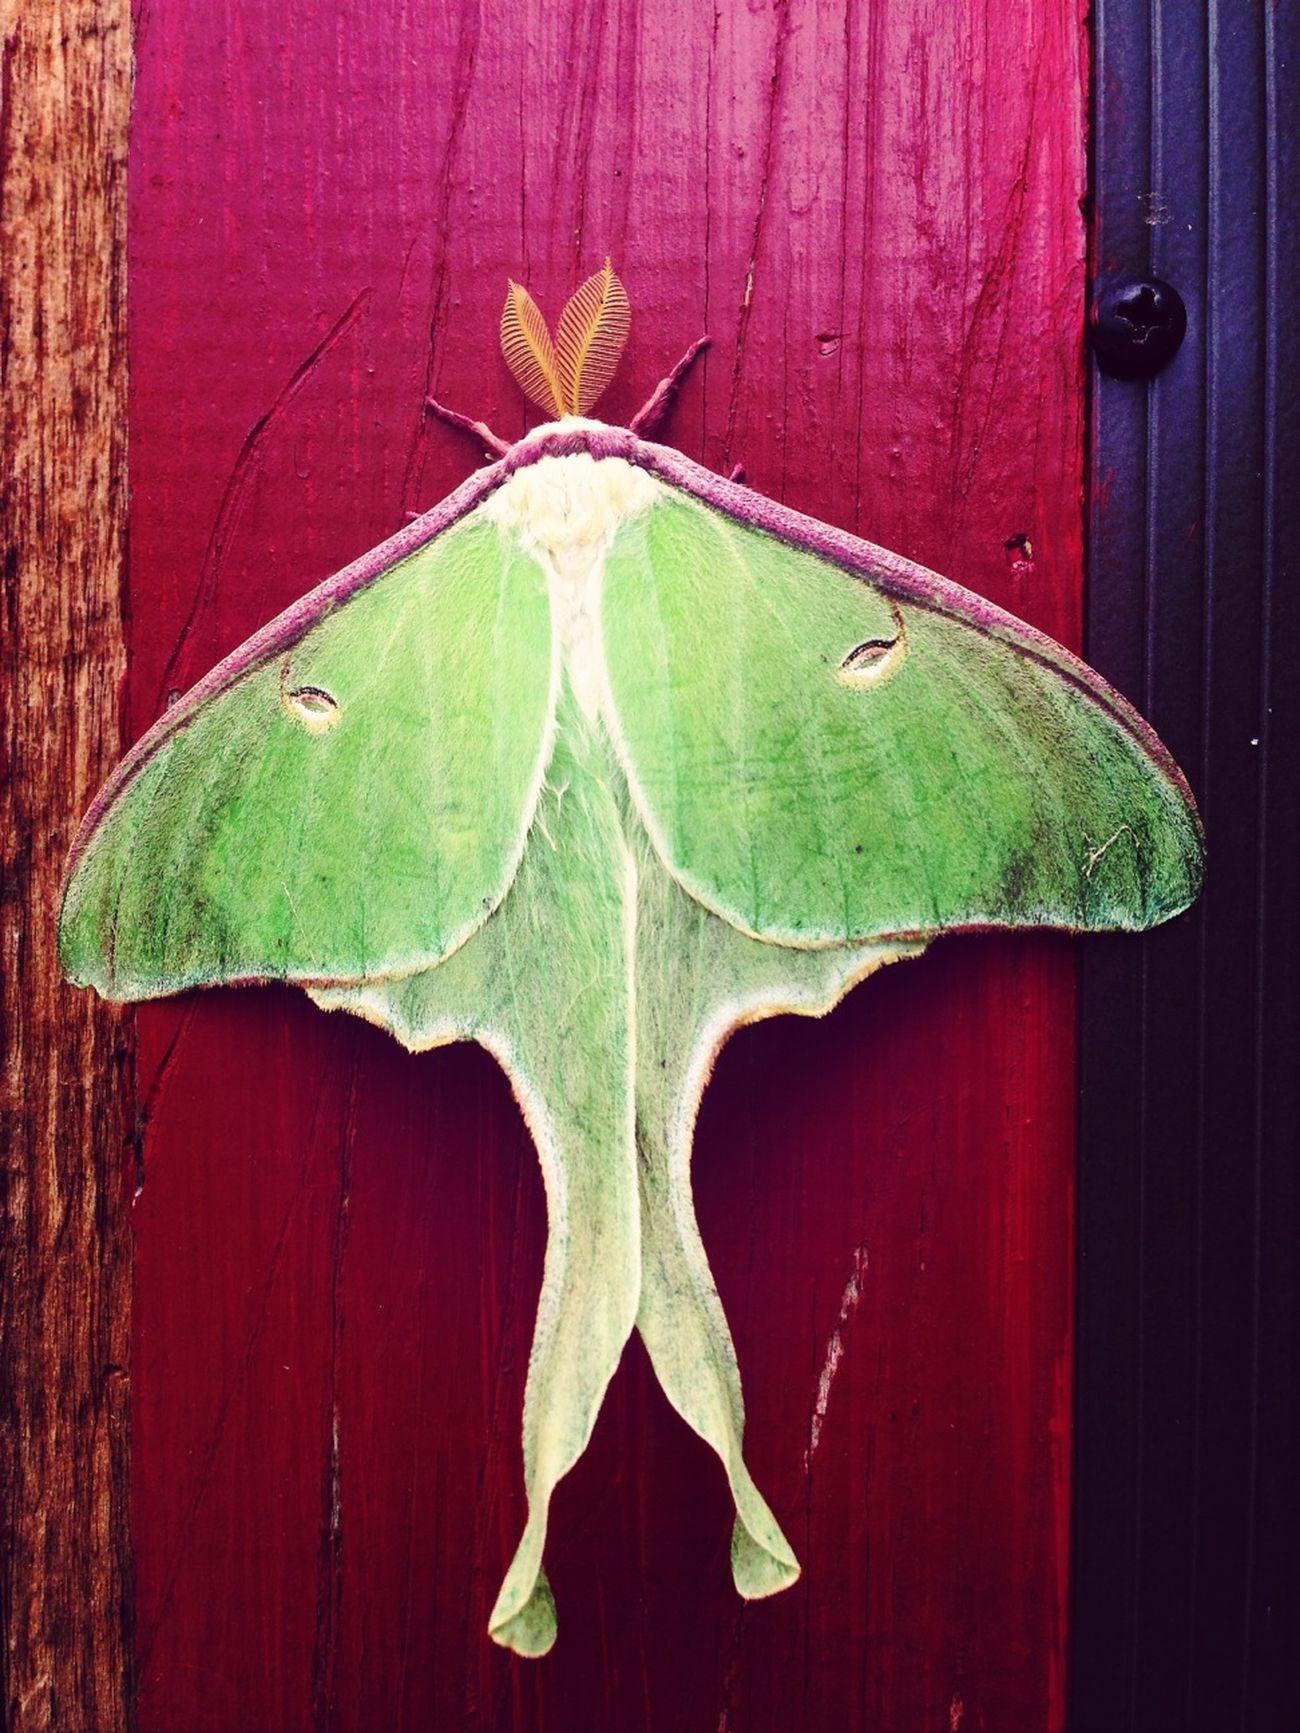 Portrait of a moth